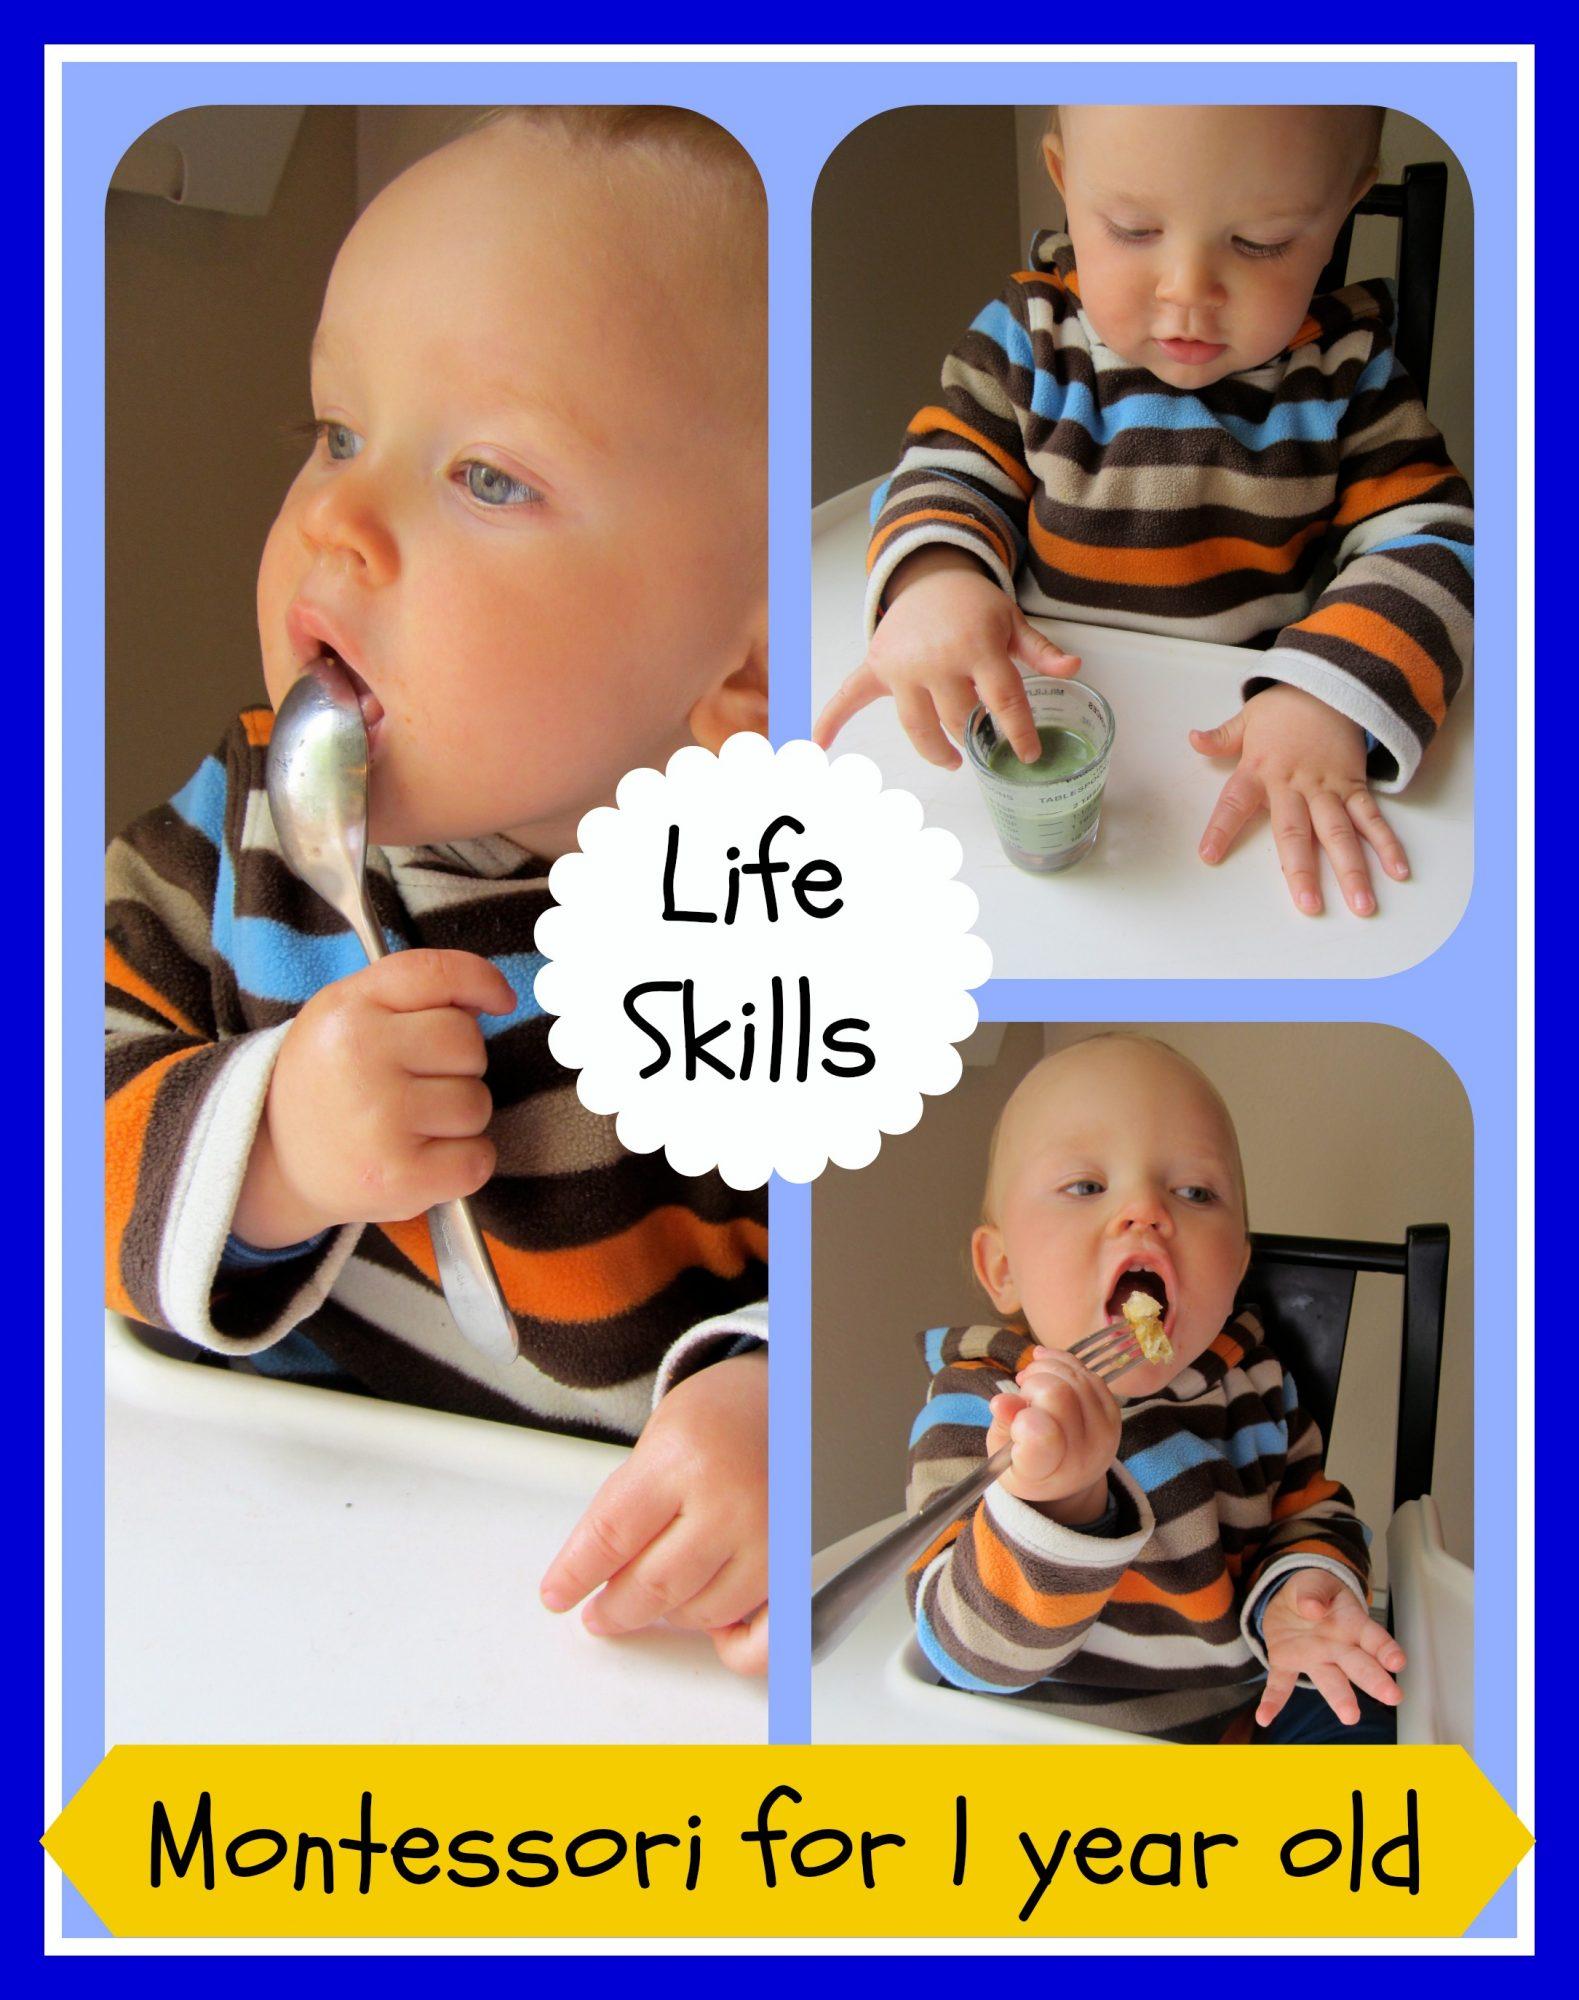 Life Skills Collage.jpg.jpg